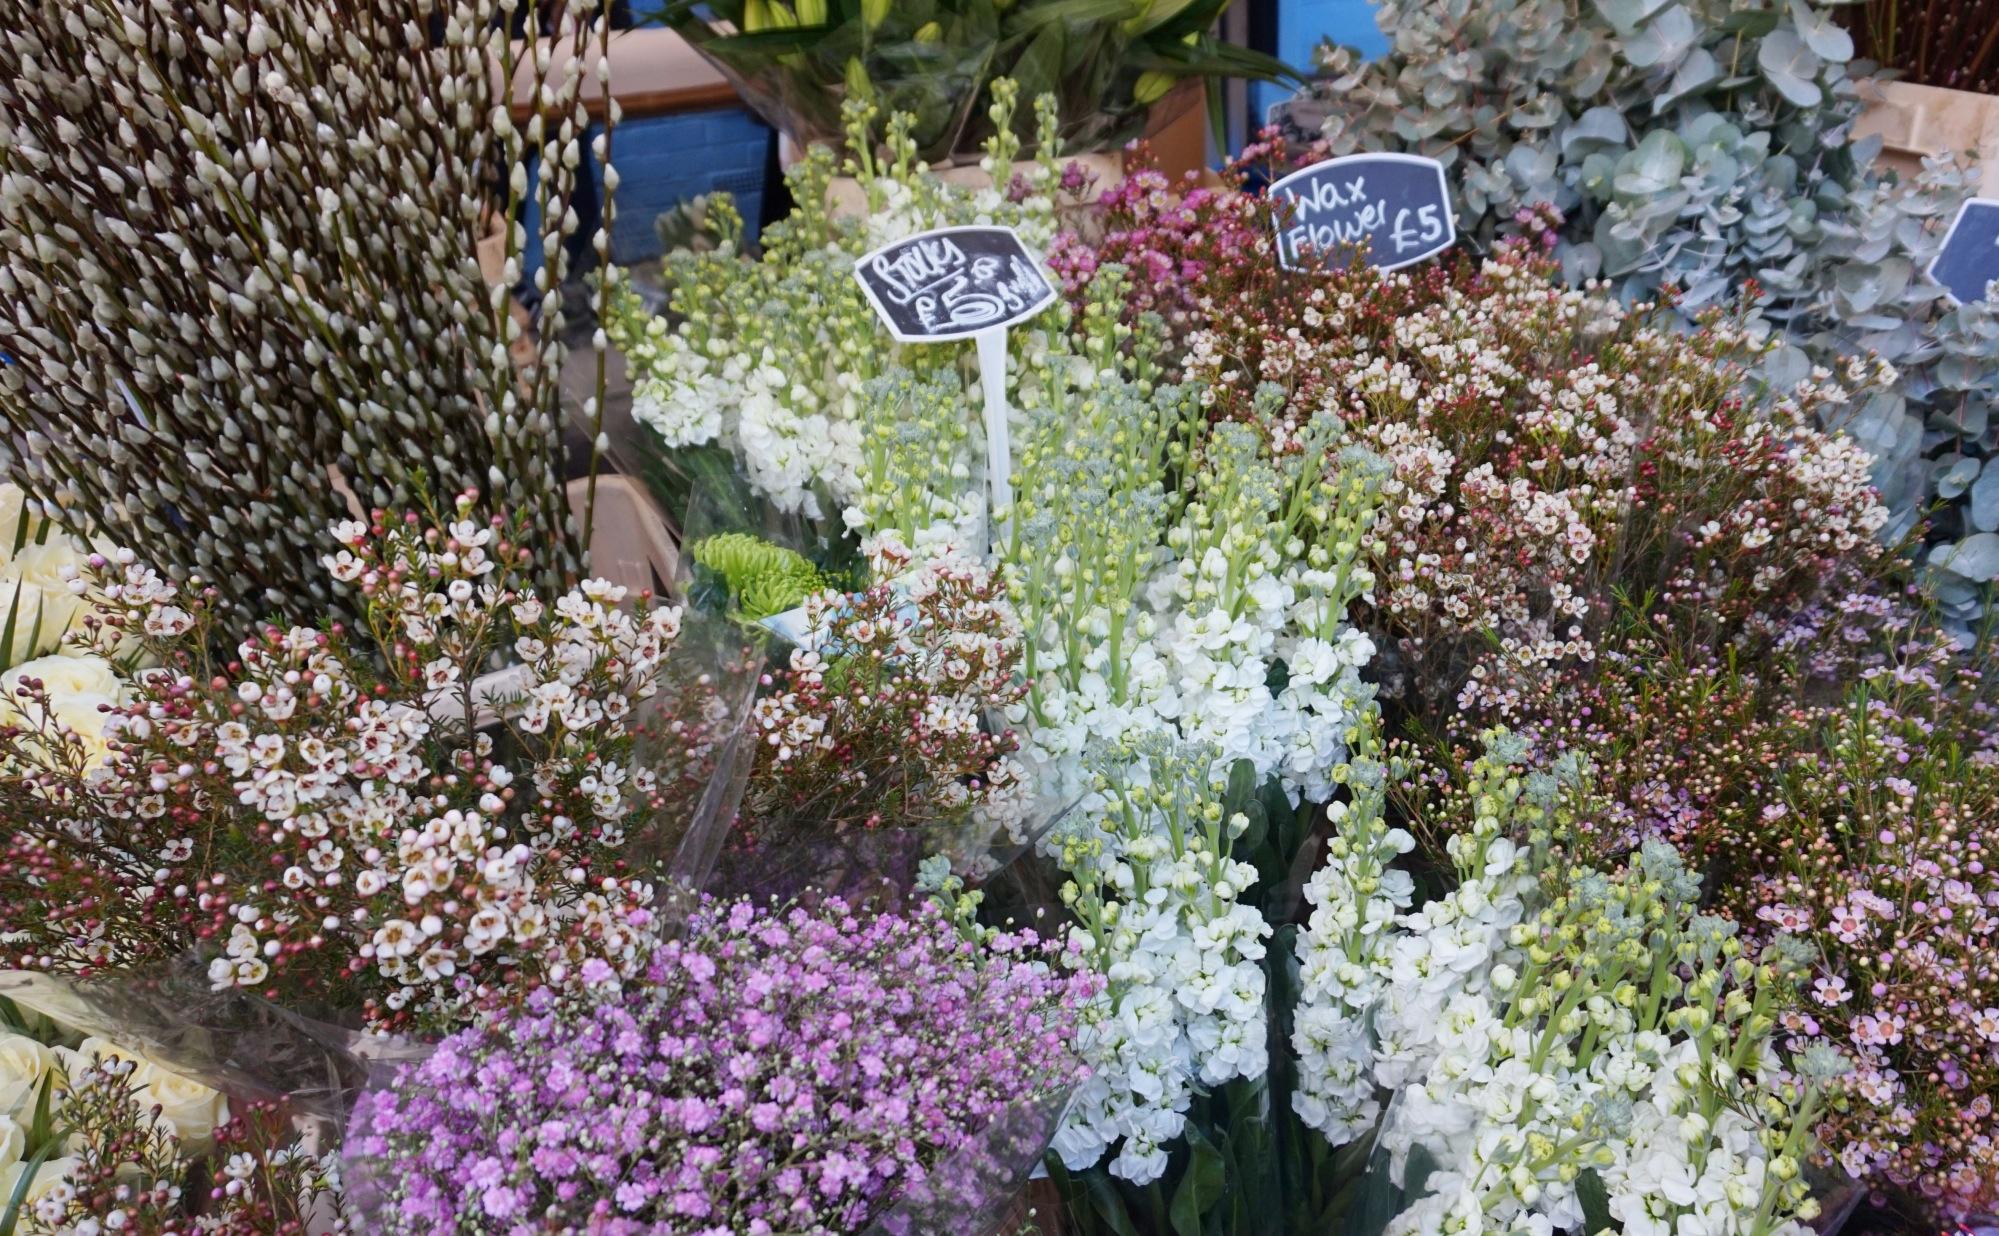 Balade-Columbia-Road-Flower-Market-8